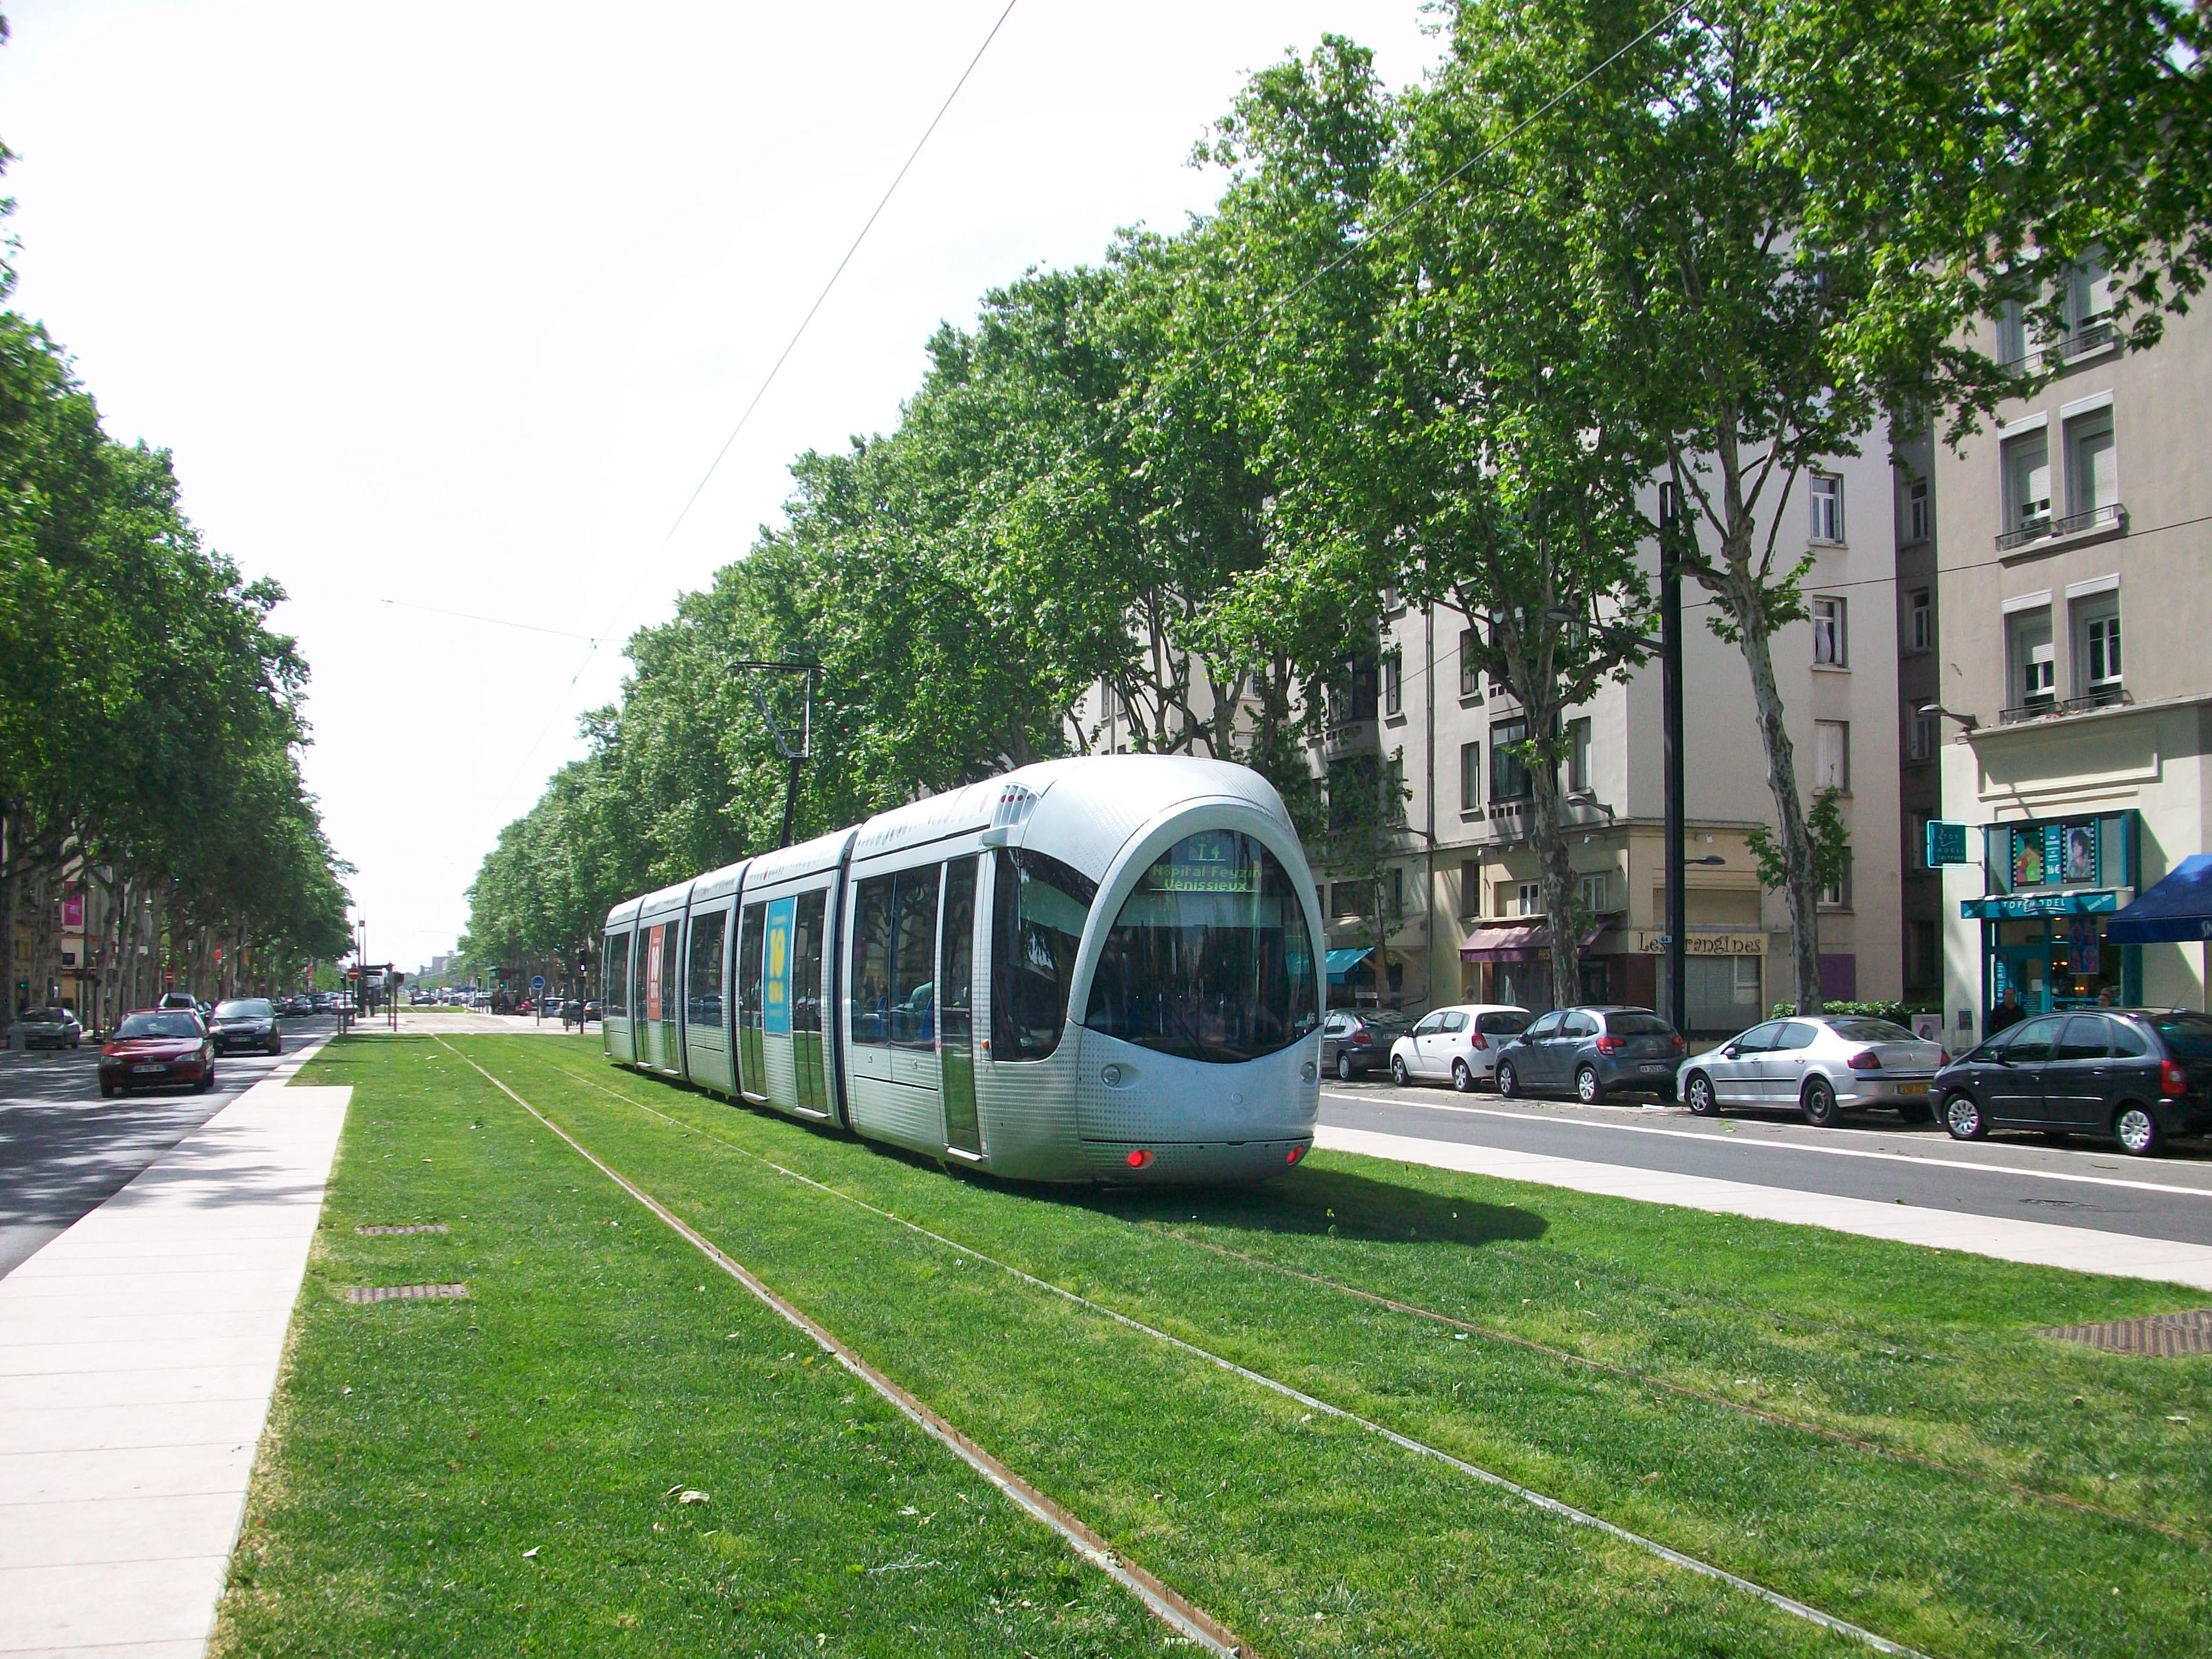 vigs r inventer le tramway quarante ann es de tcsp tramways et transports guid s en france. Black Bedroom Furniture Sets. Home Design Ideas